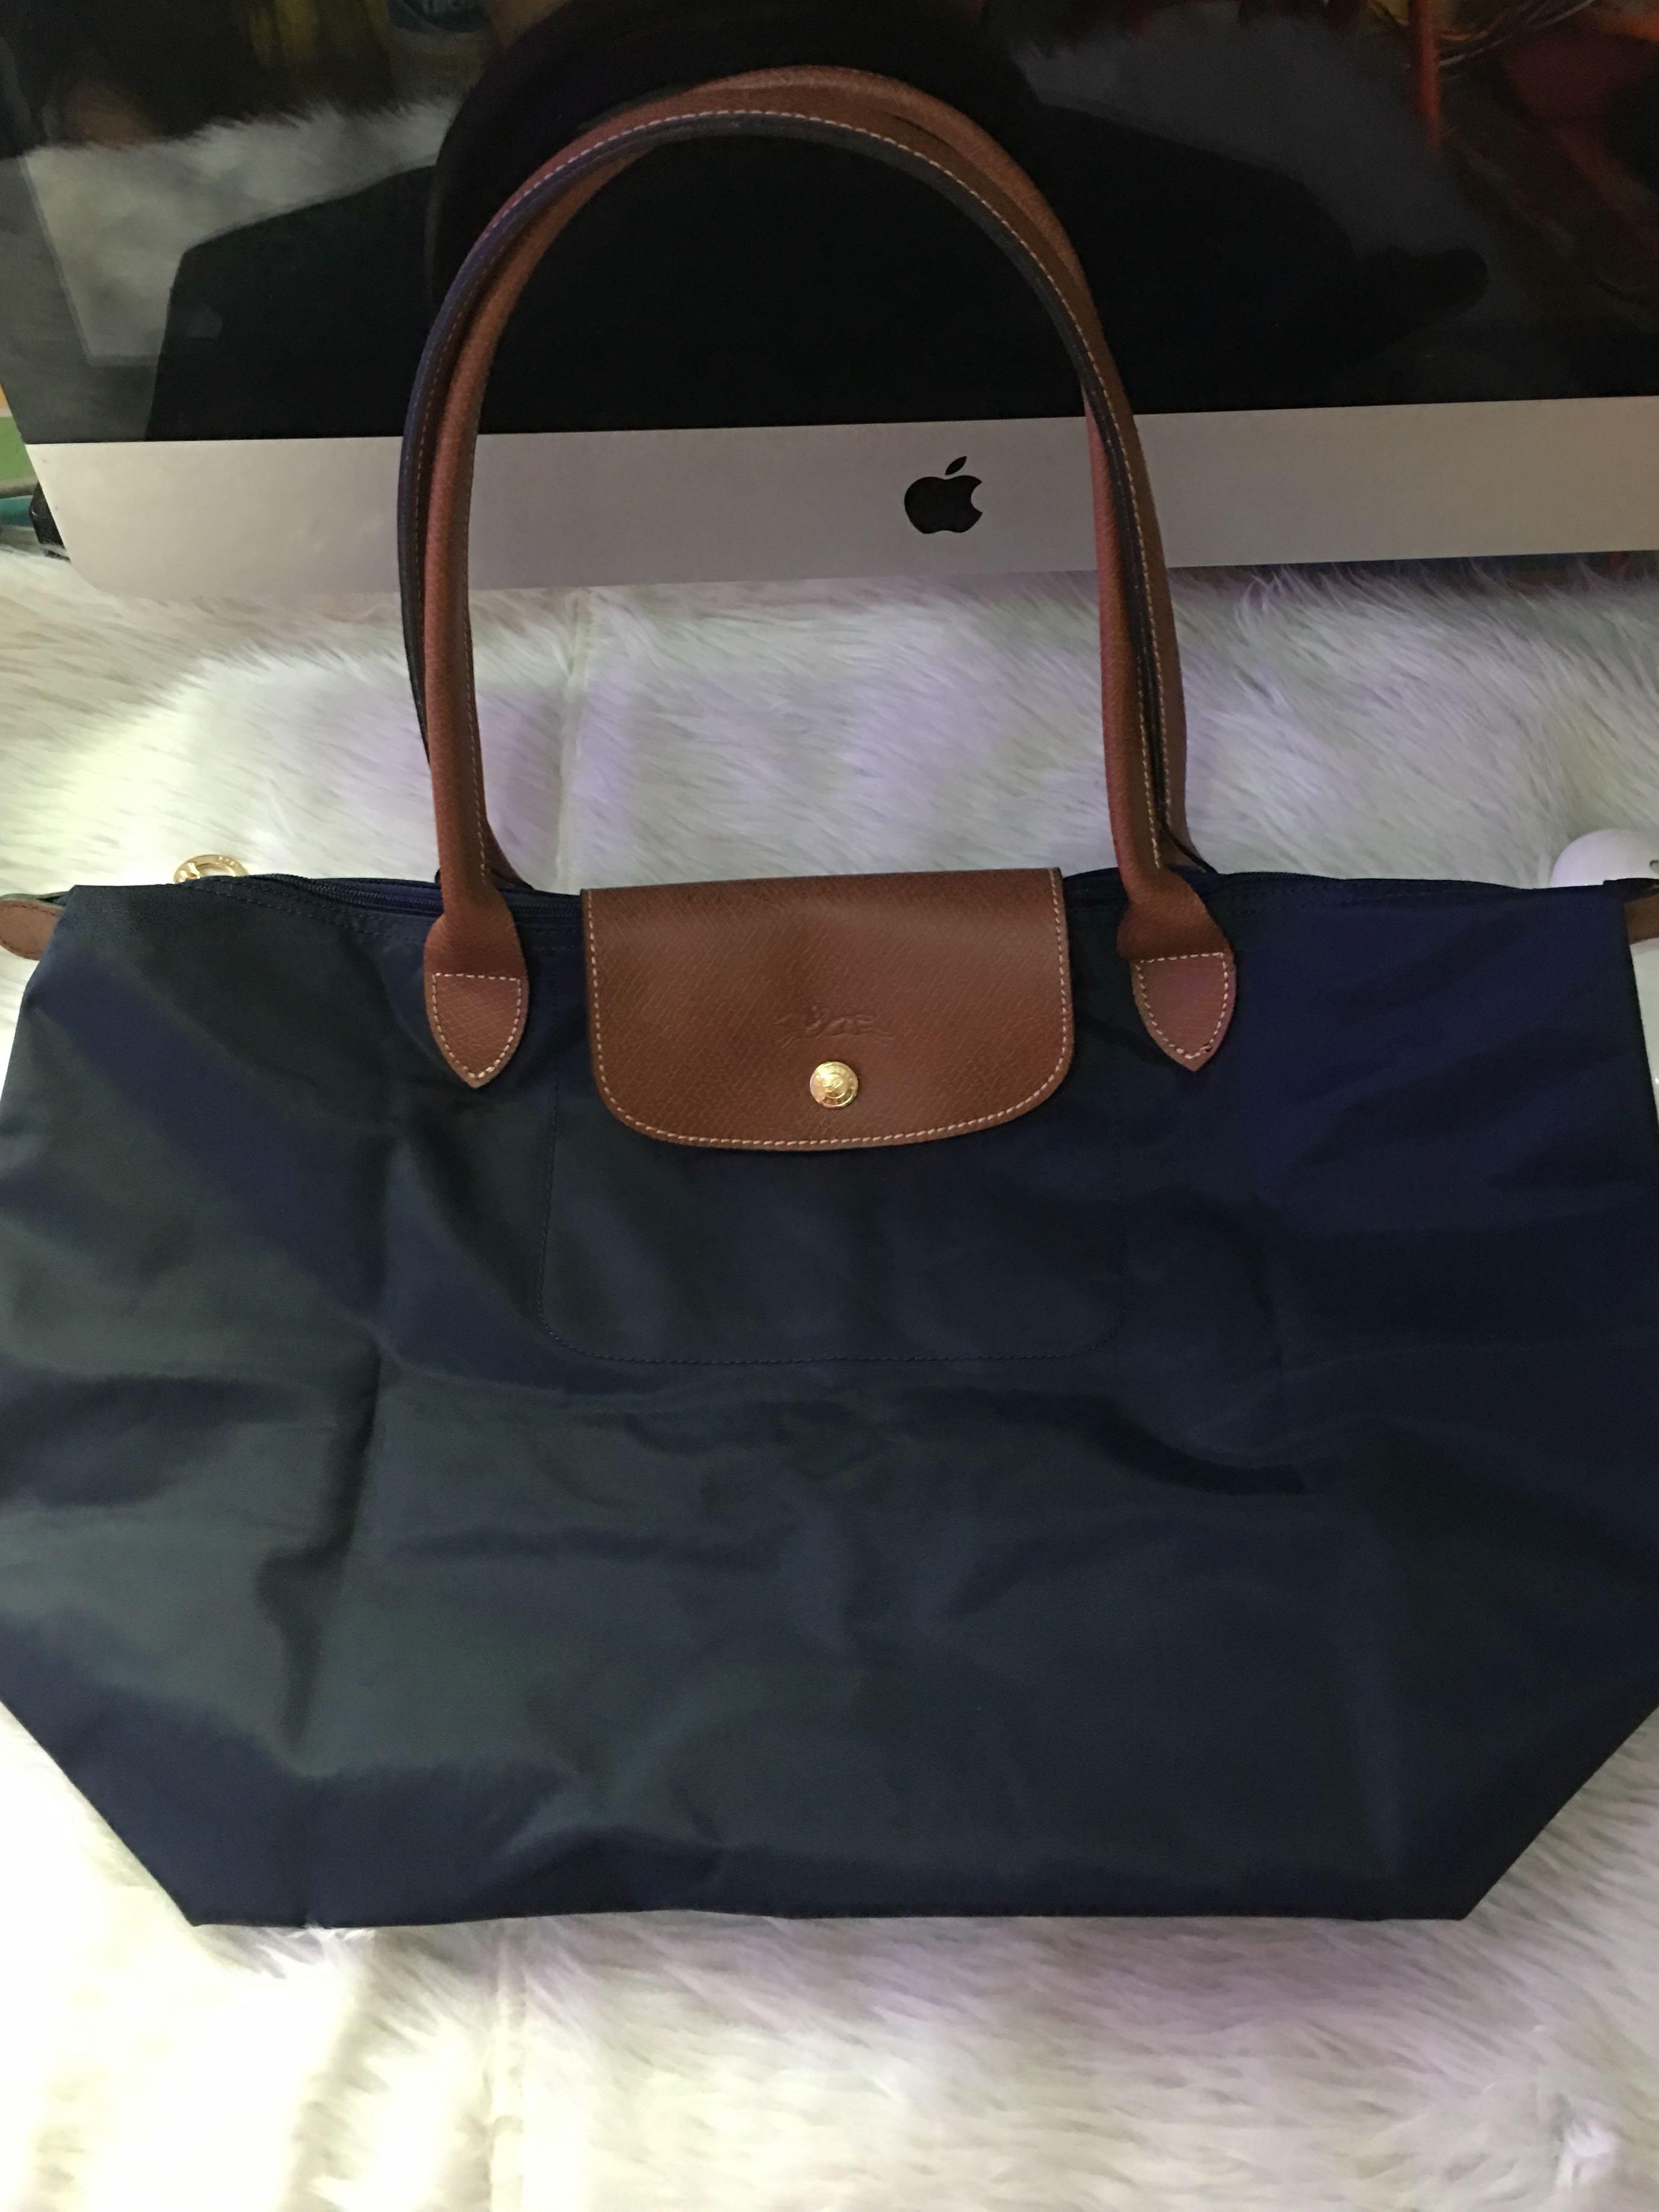 Original Longchamp Bags   Wallets Metro Manila Philippines marianne029  Source · Authentic longchamp le pliage medium navy blue Women s Fashion 20374a2c50265